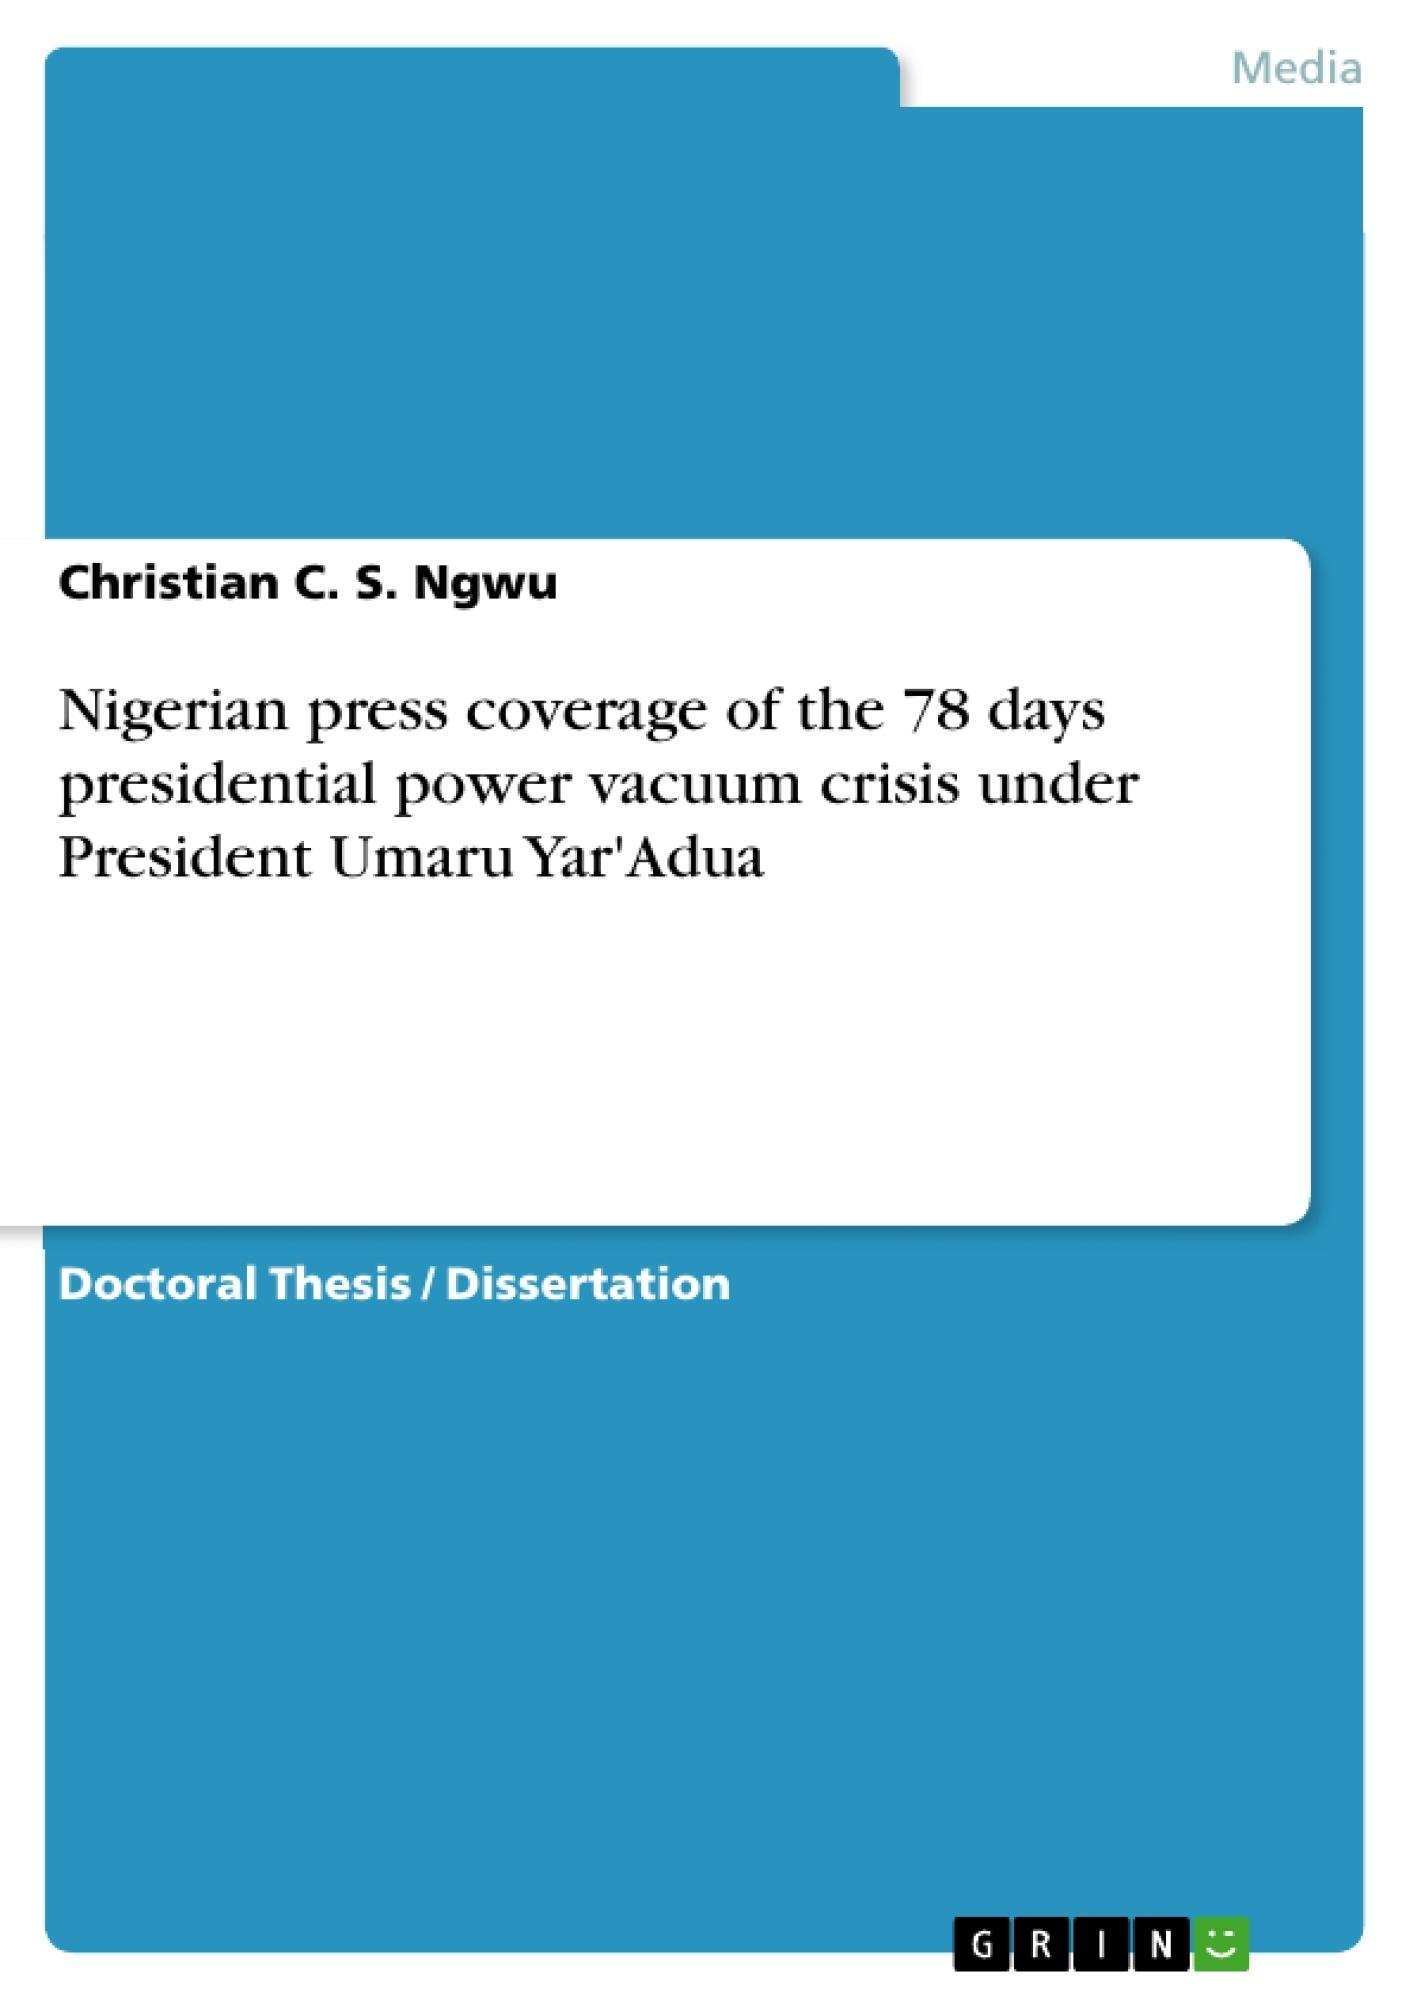 Title: Nigerian press coverage of the 78 days presidential power vacuum crisis under President Umaru Yar'Adua